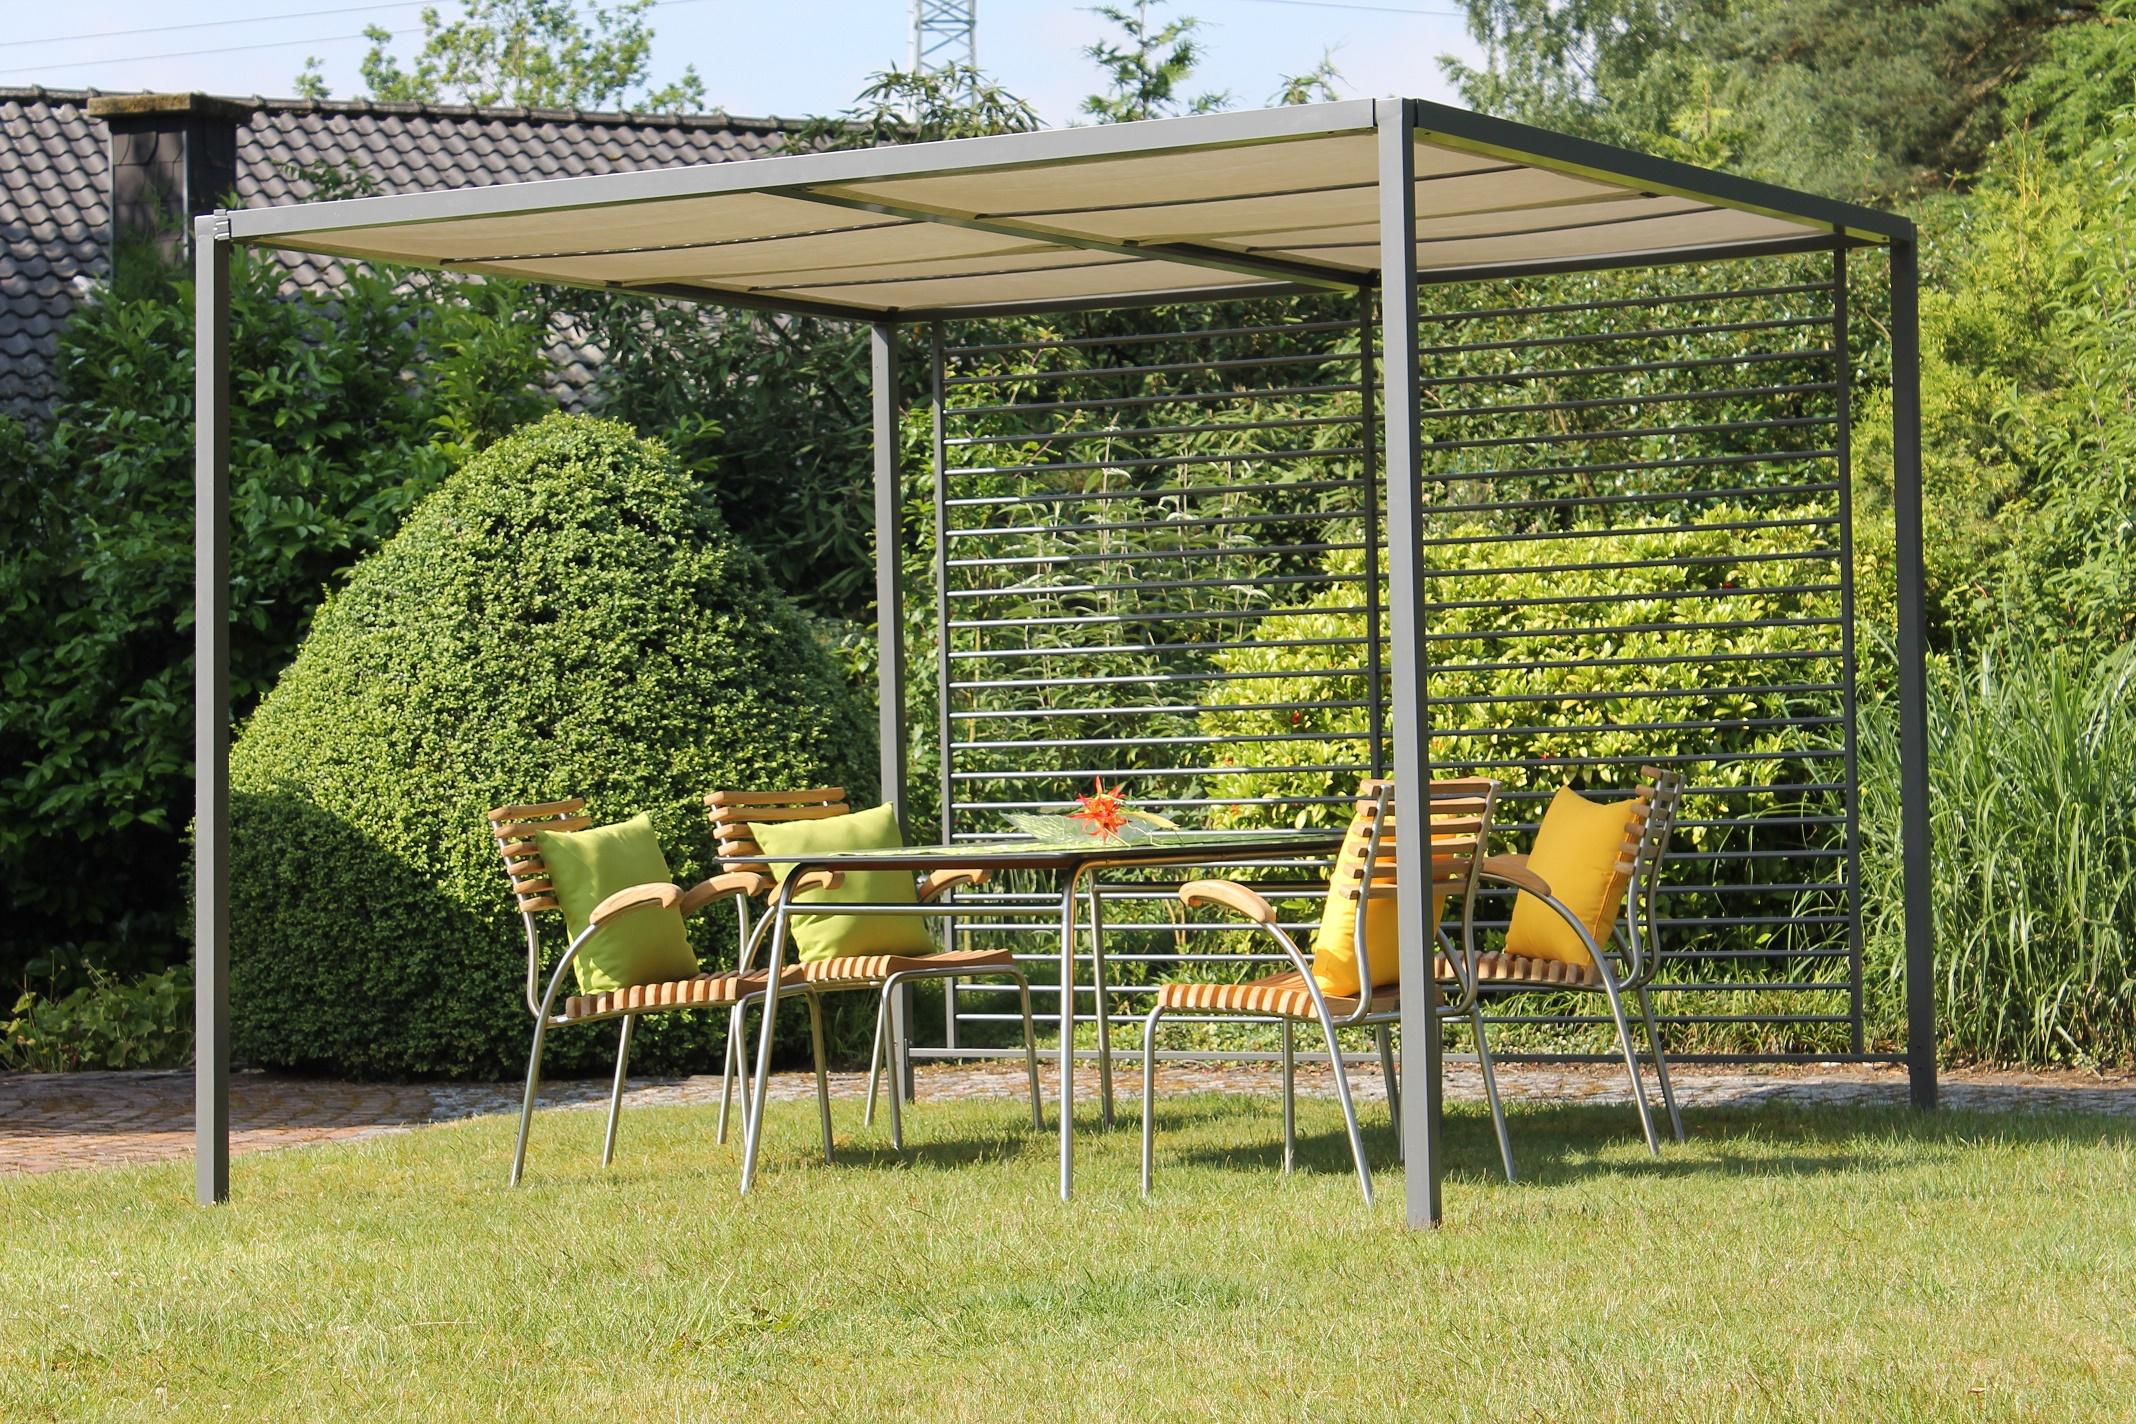 leco design pergola 2 8x2 8 garten terrasse berdachung sonnenschutz pavillon ebay. Black Bedroom Furniture Sets. Home Design Ideas